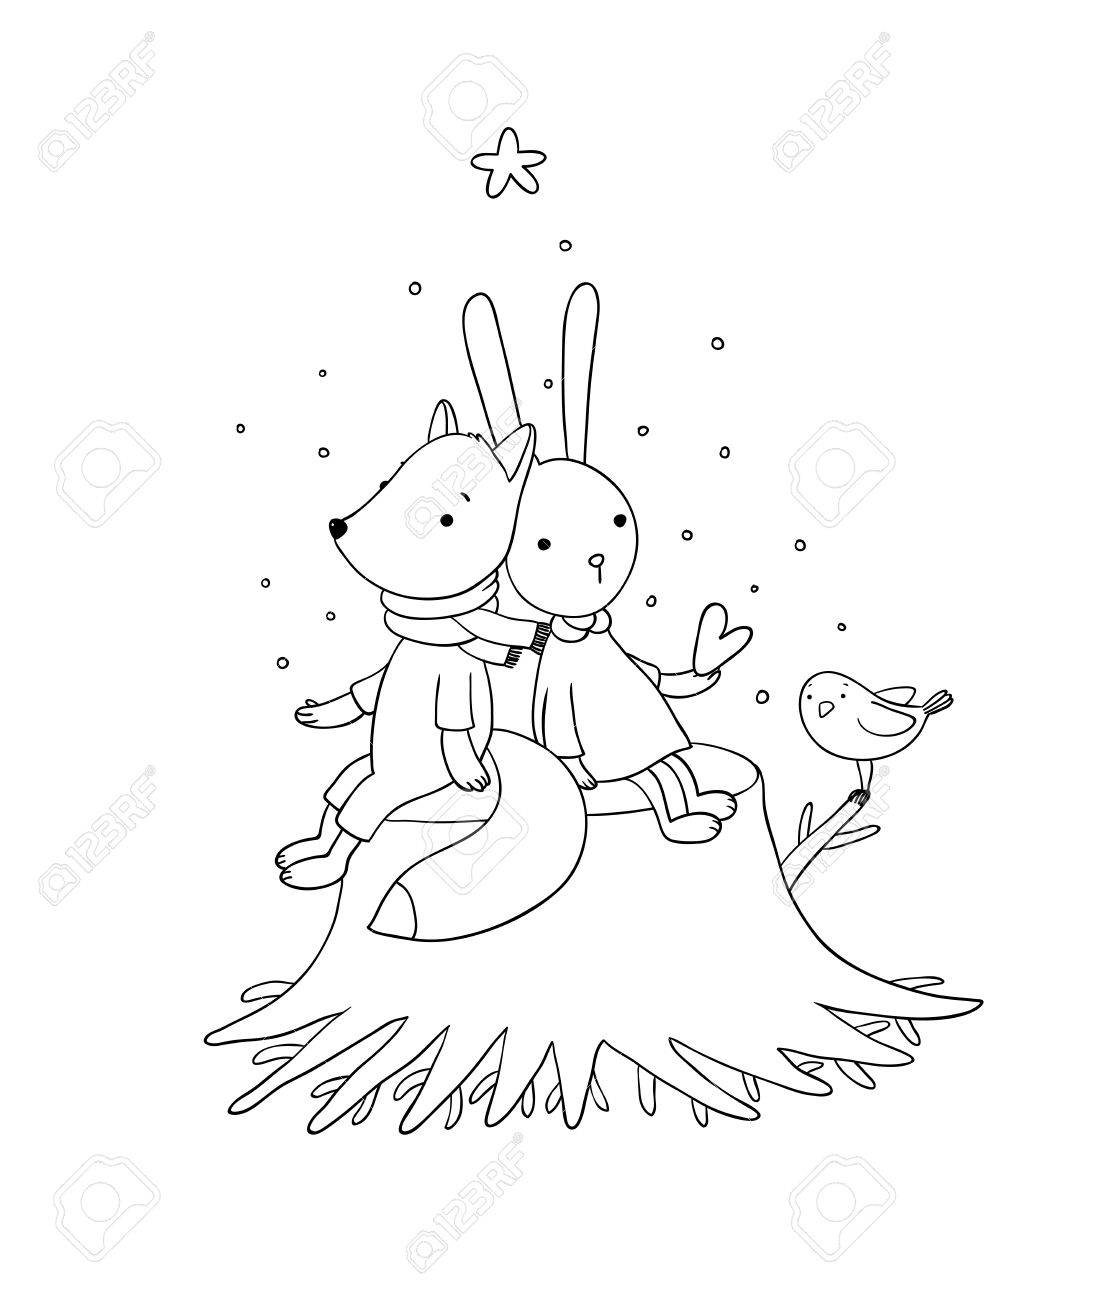 1114x1300 Fox, Rabbit And Bird Sitting On A Tree Stump. Animals